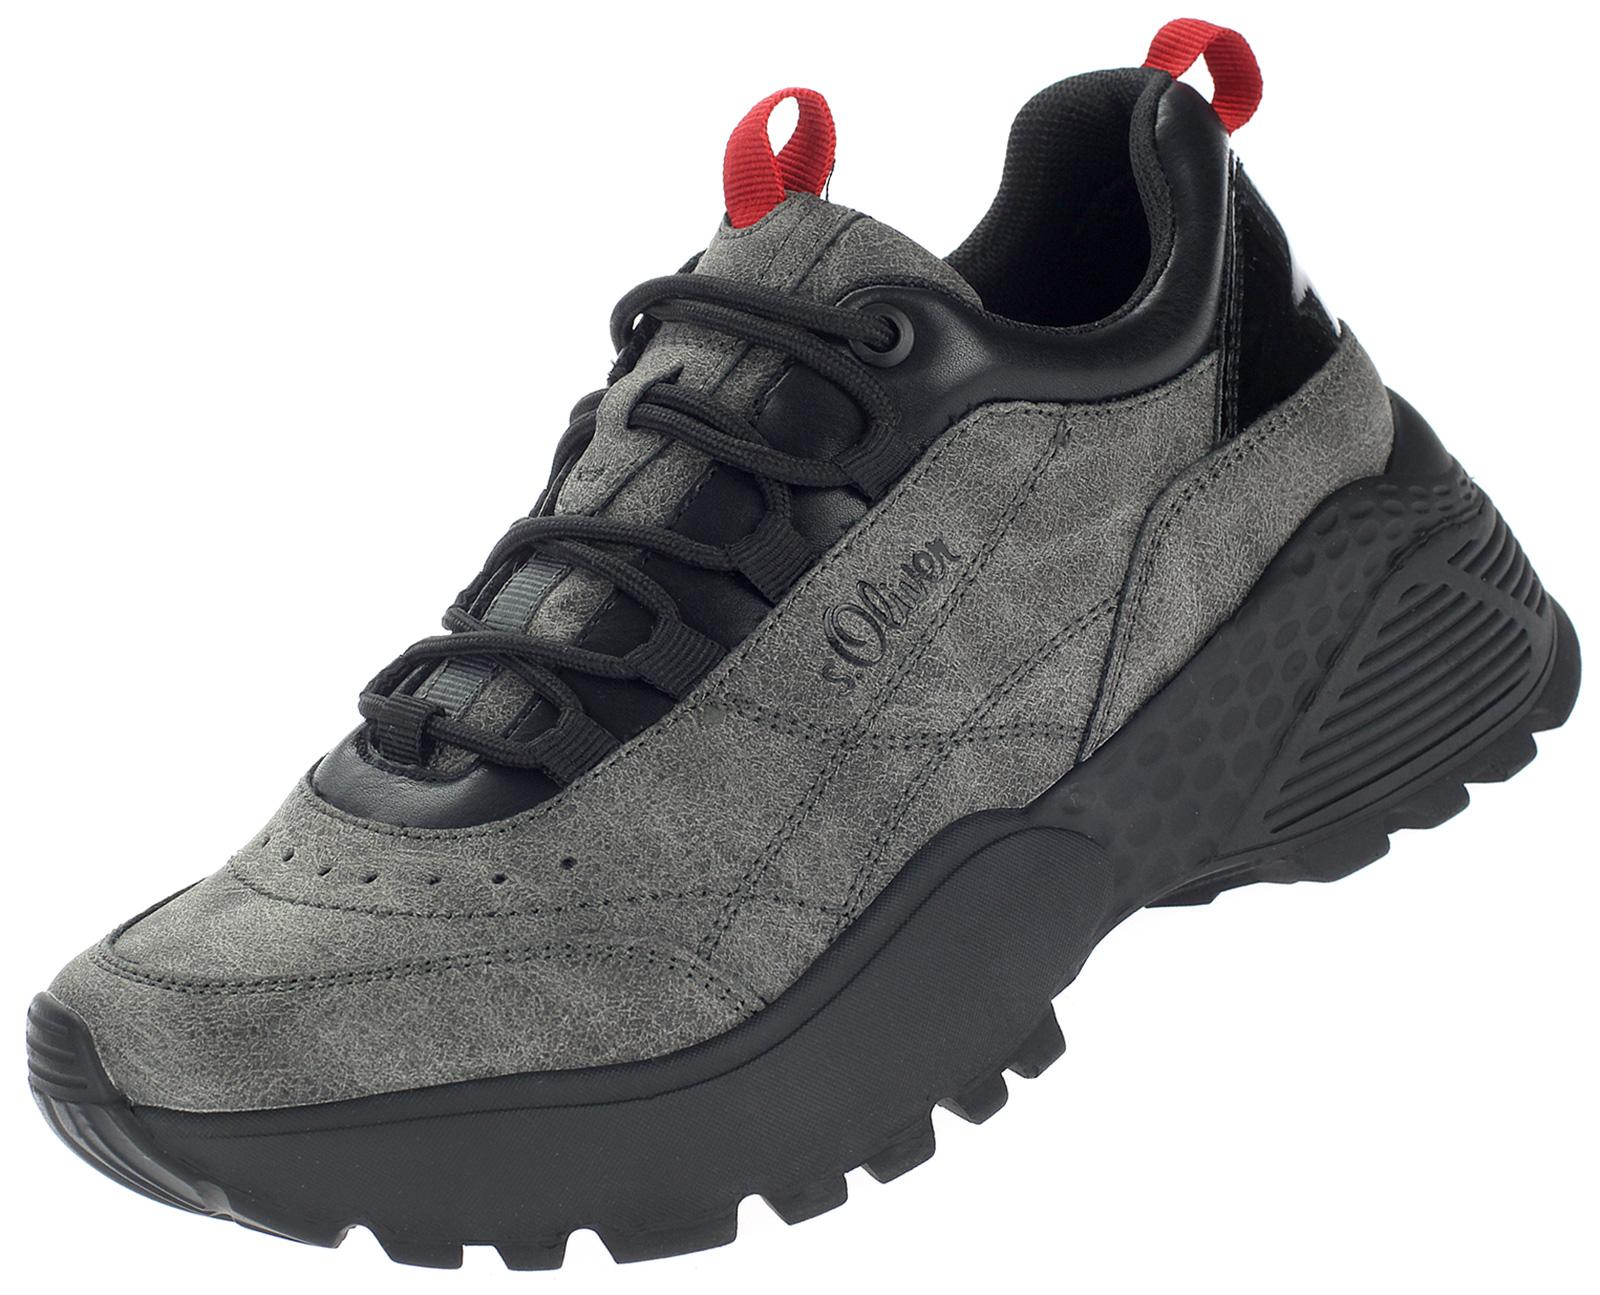 s.Oliver Damen Sneaker in Grau 5-23602-35